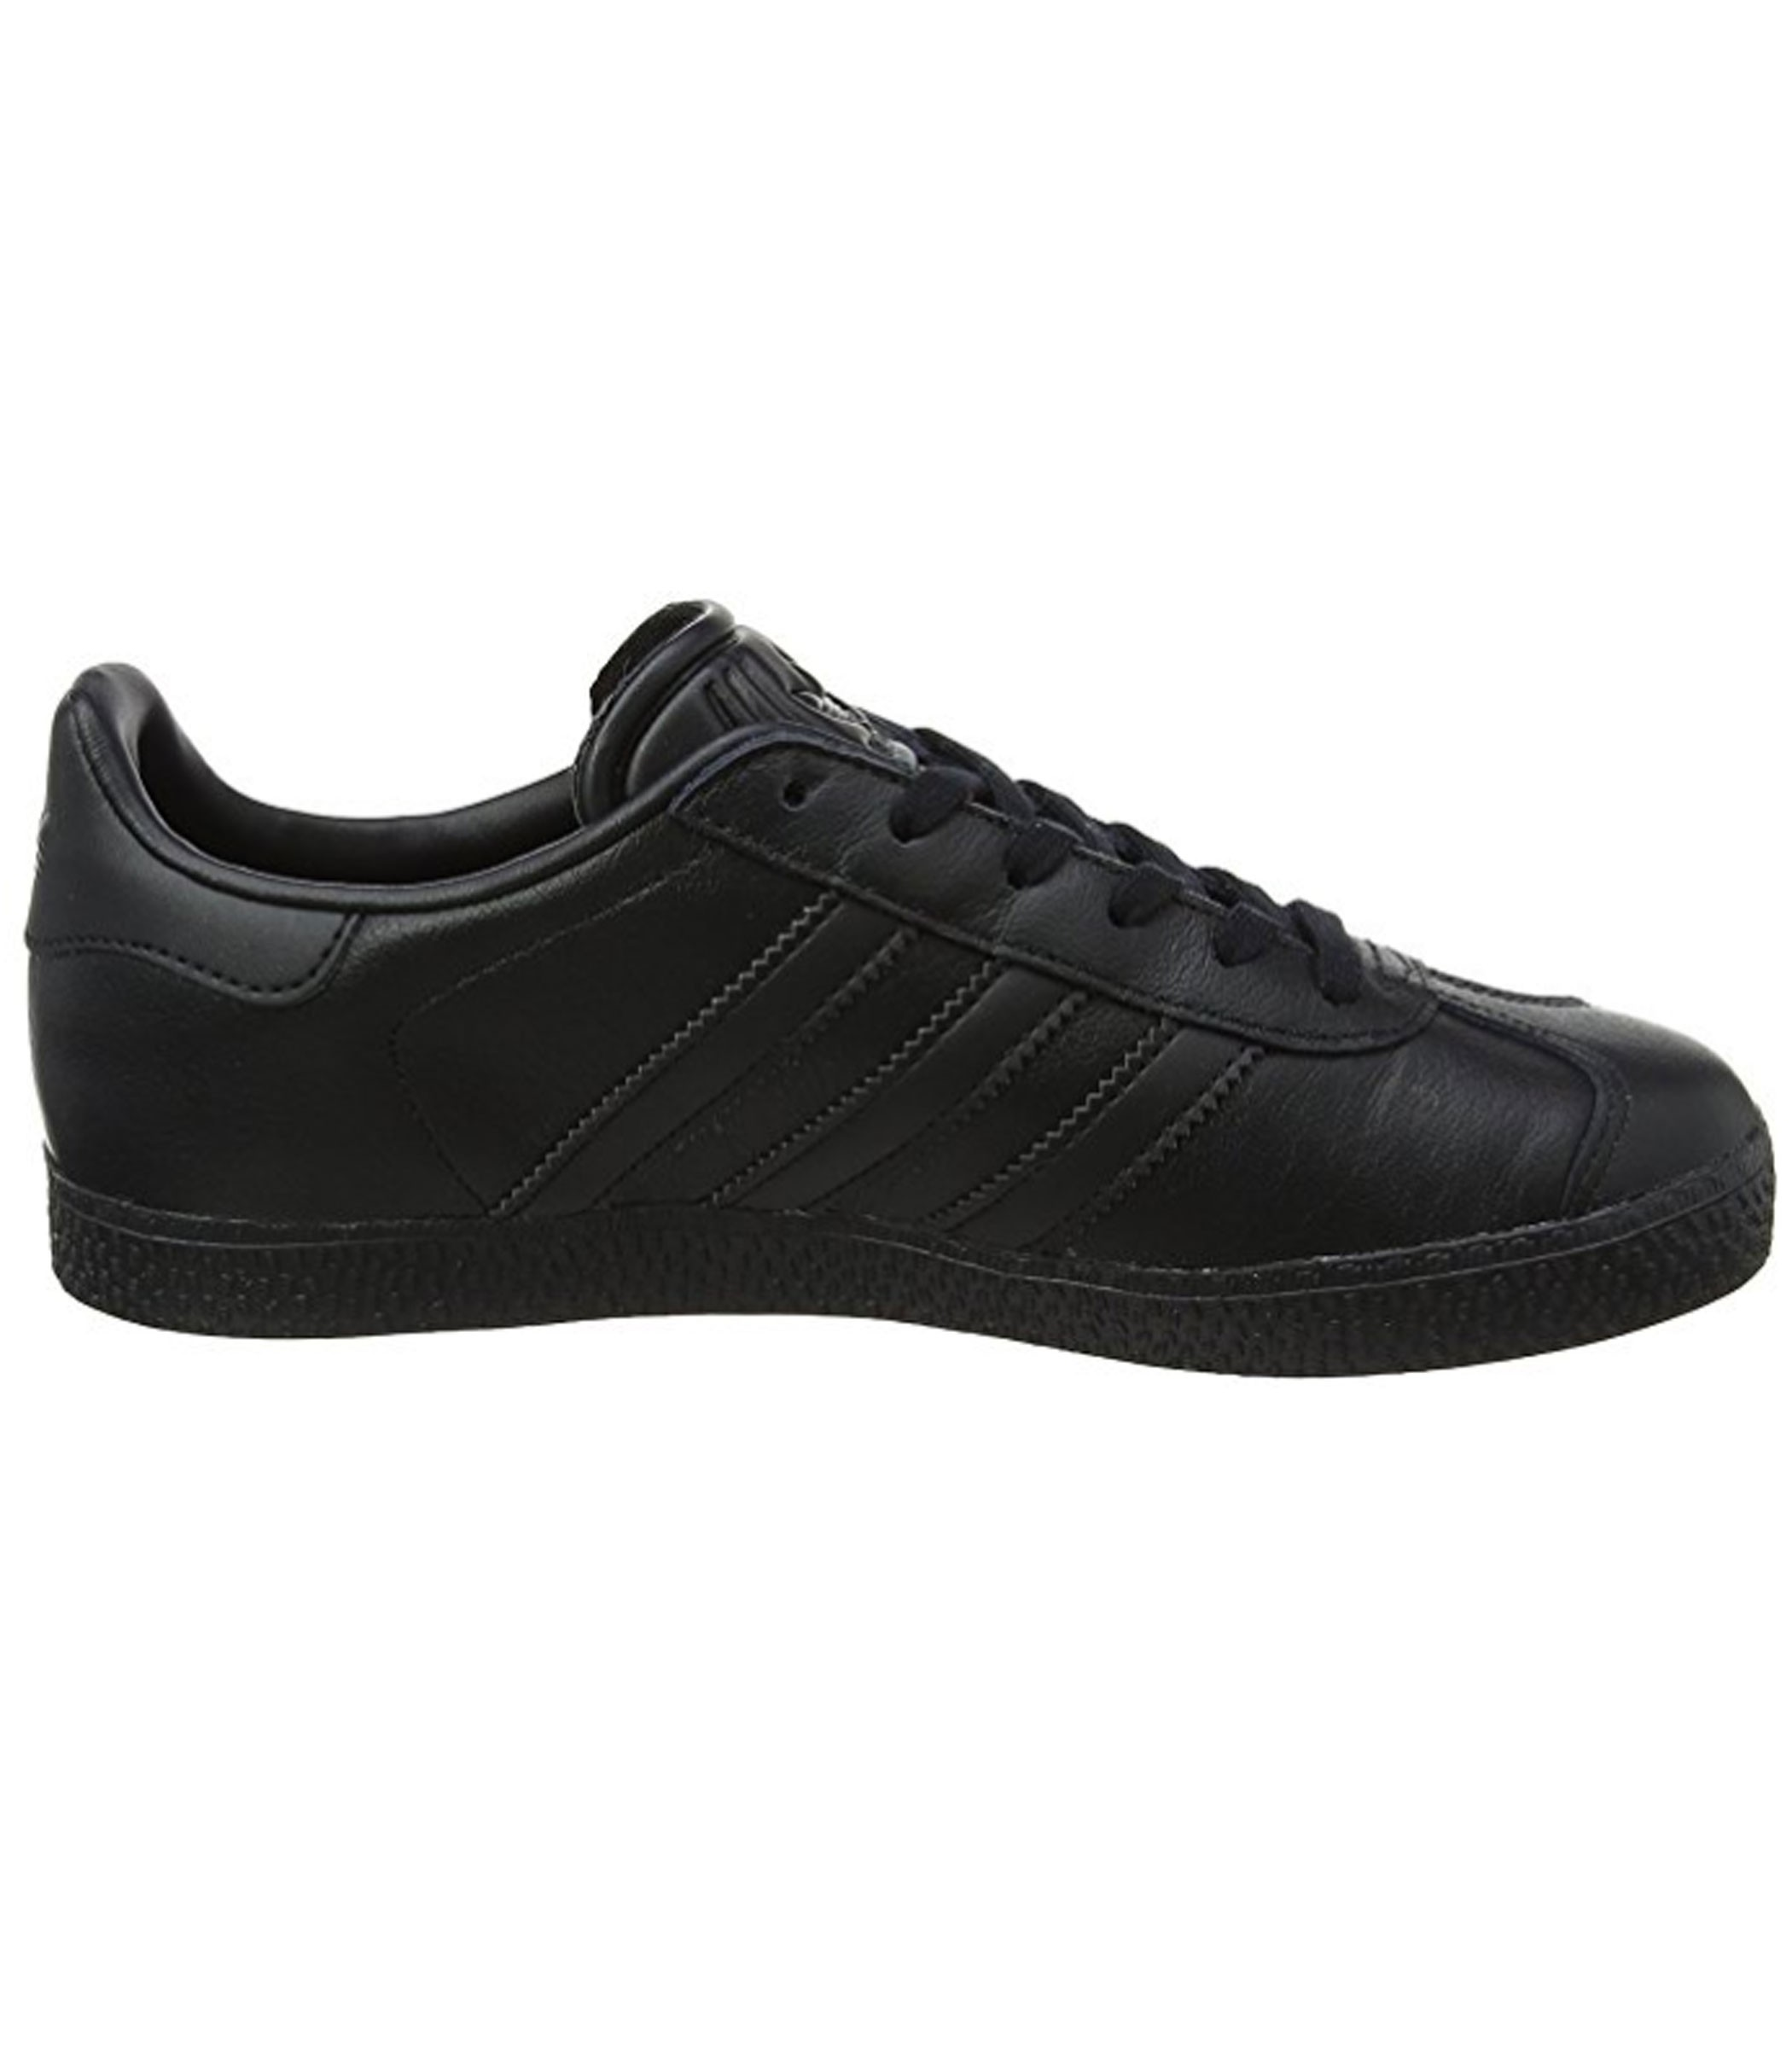 adidas gazelle donna nere